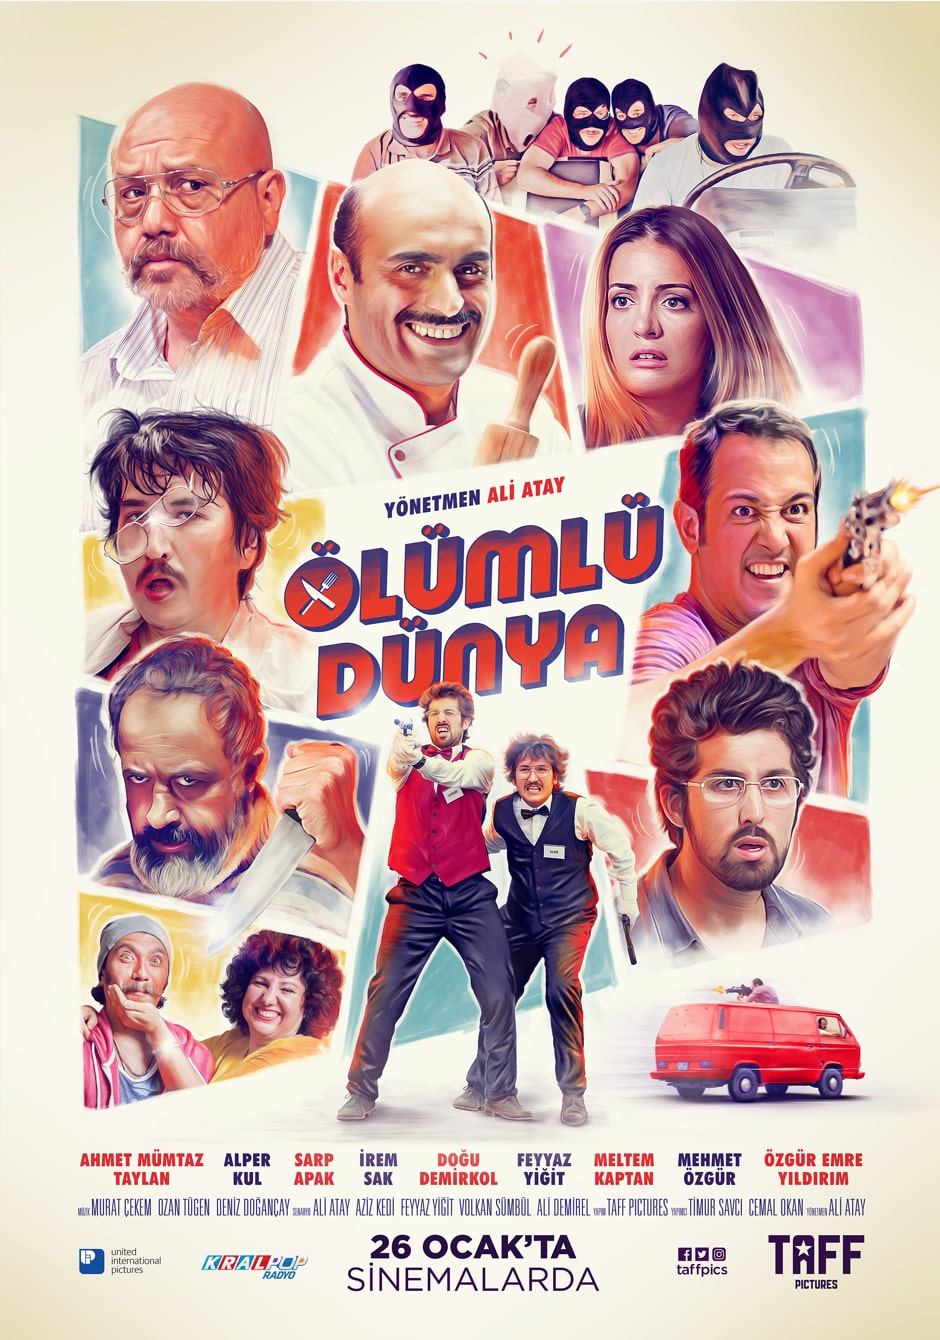 Olumlu_Dunya_Poster Copy 2-min